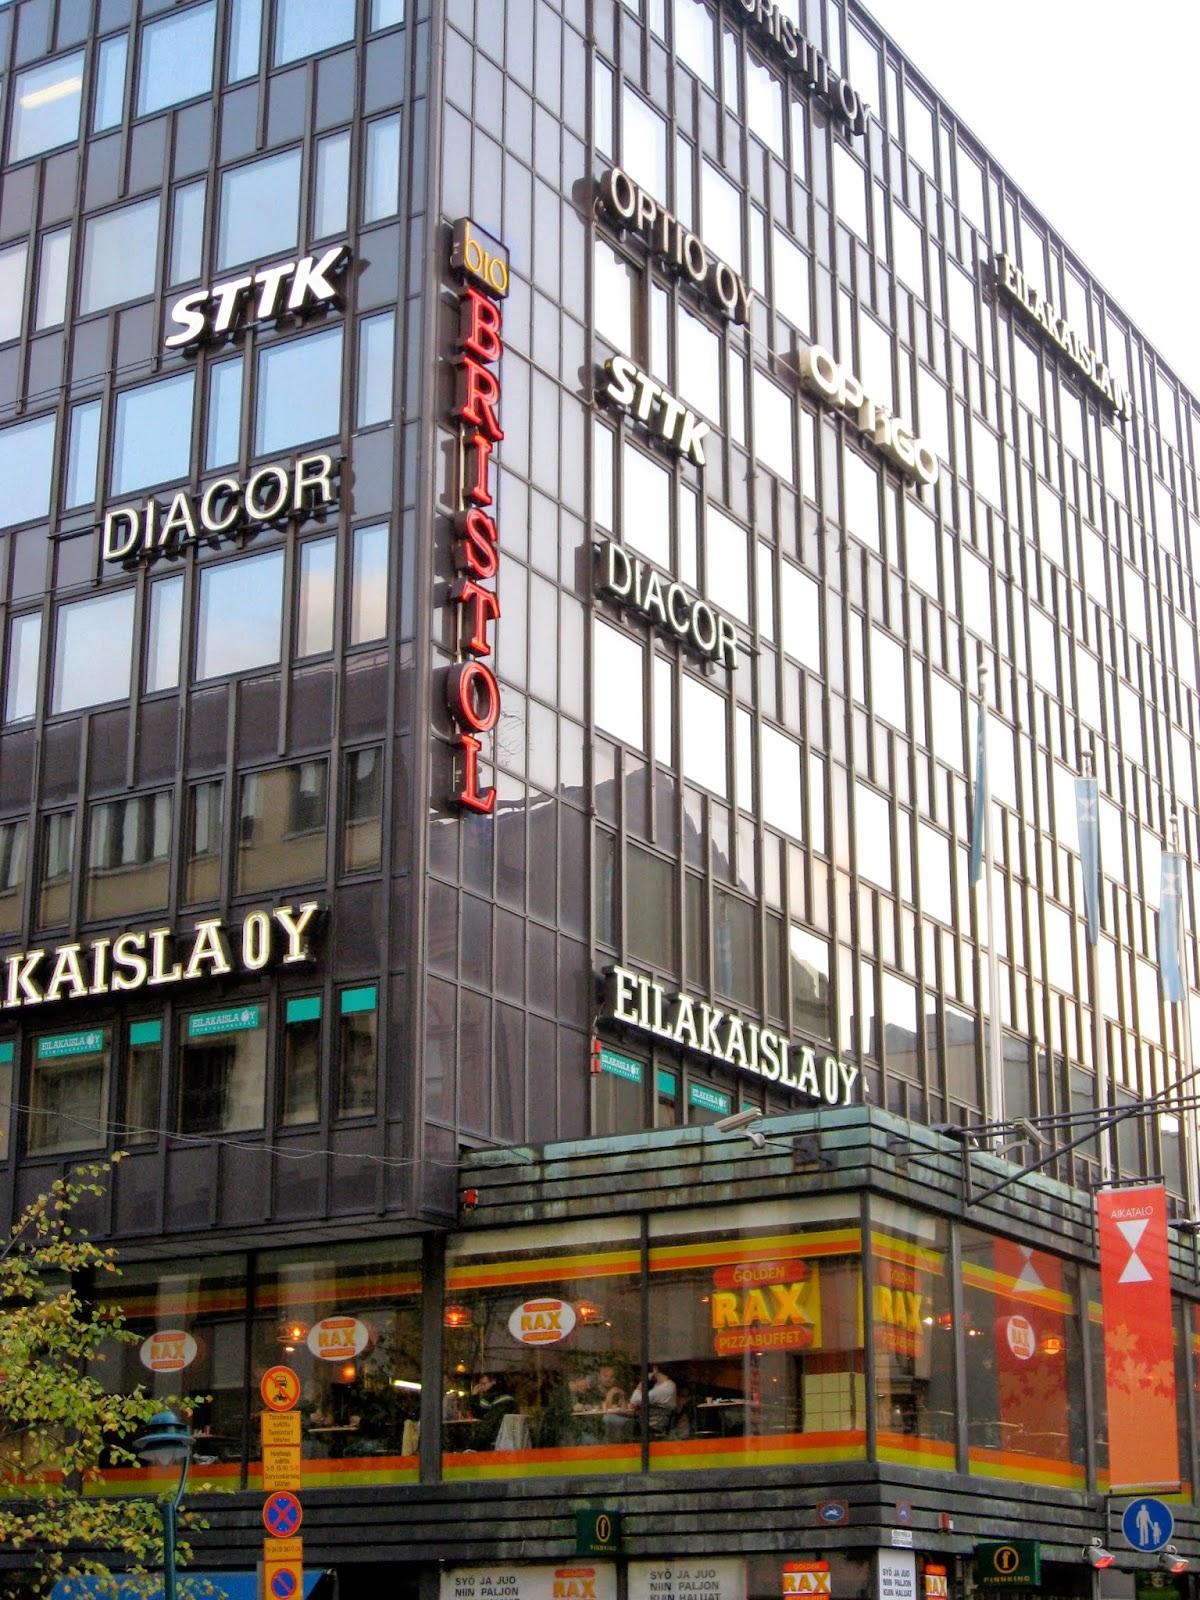 Elokuvateatteri Oulu